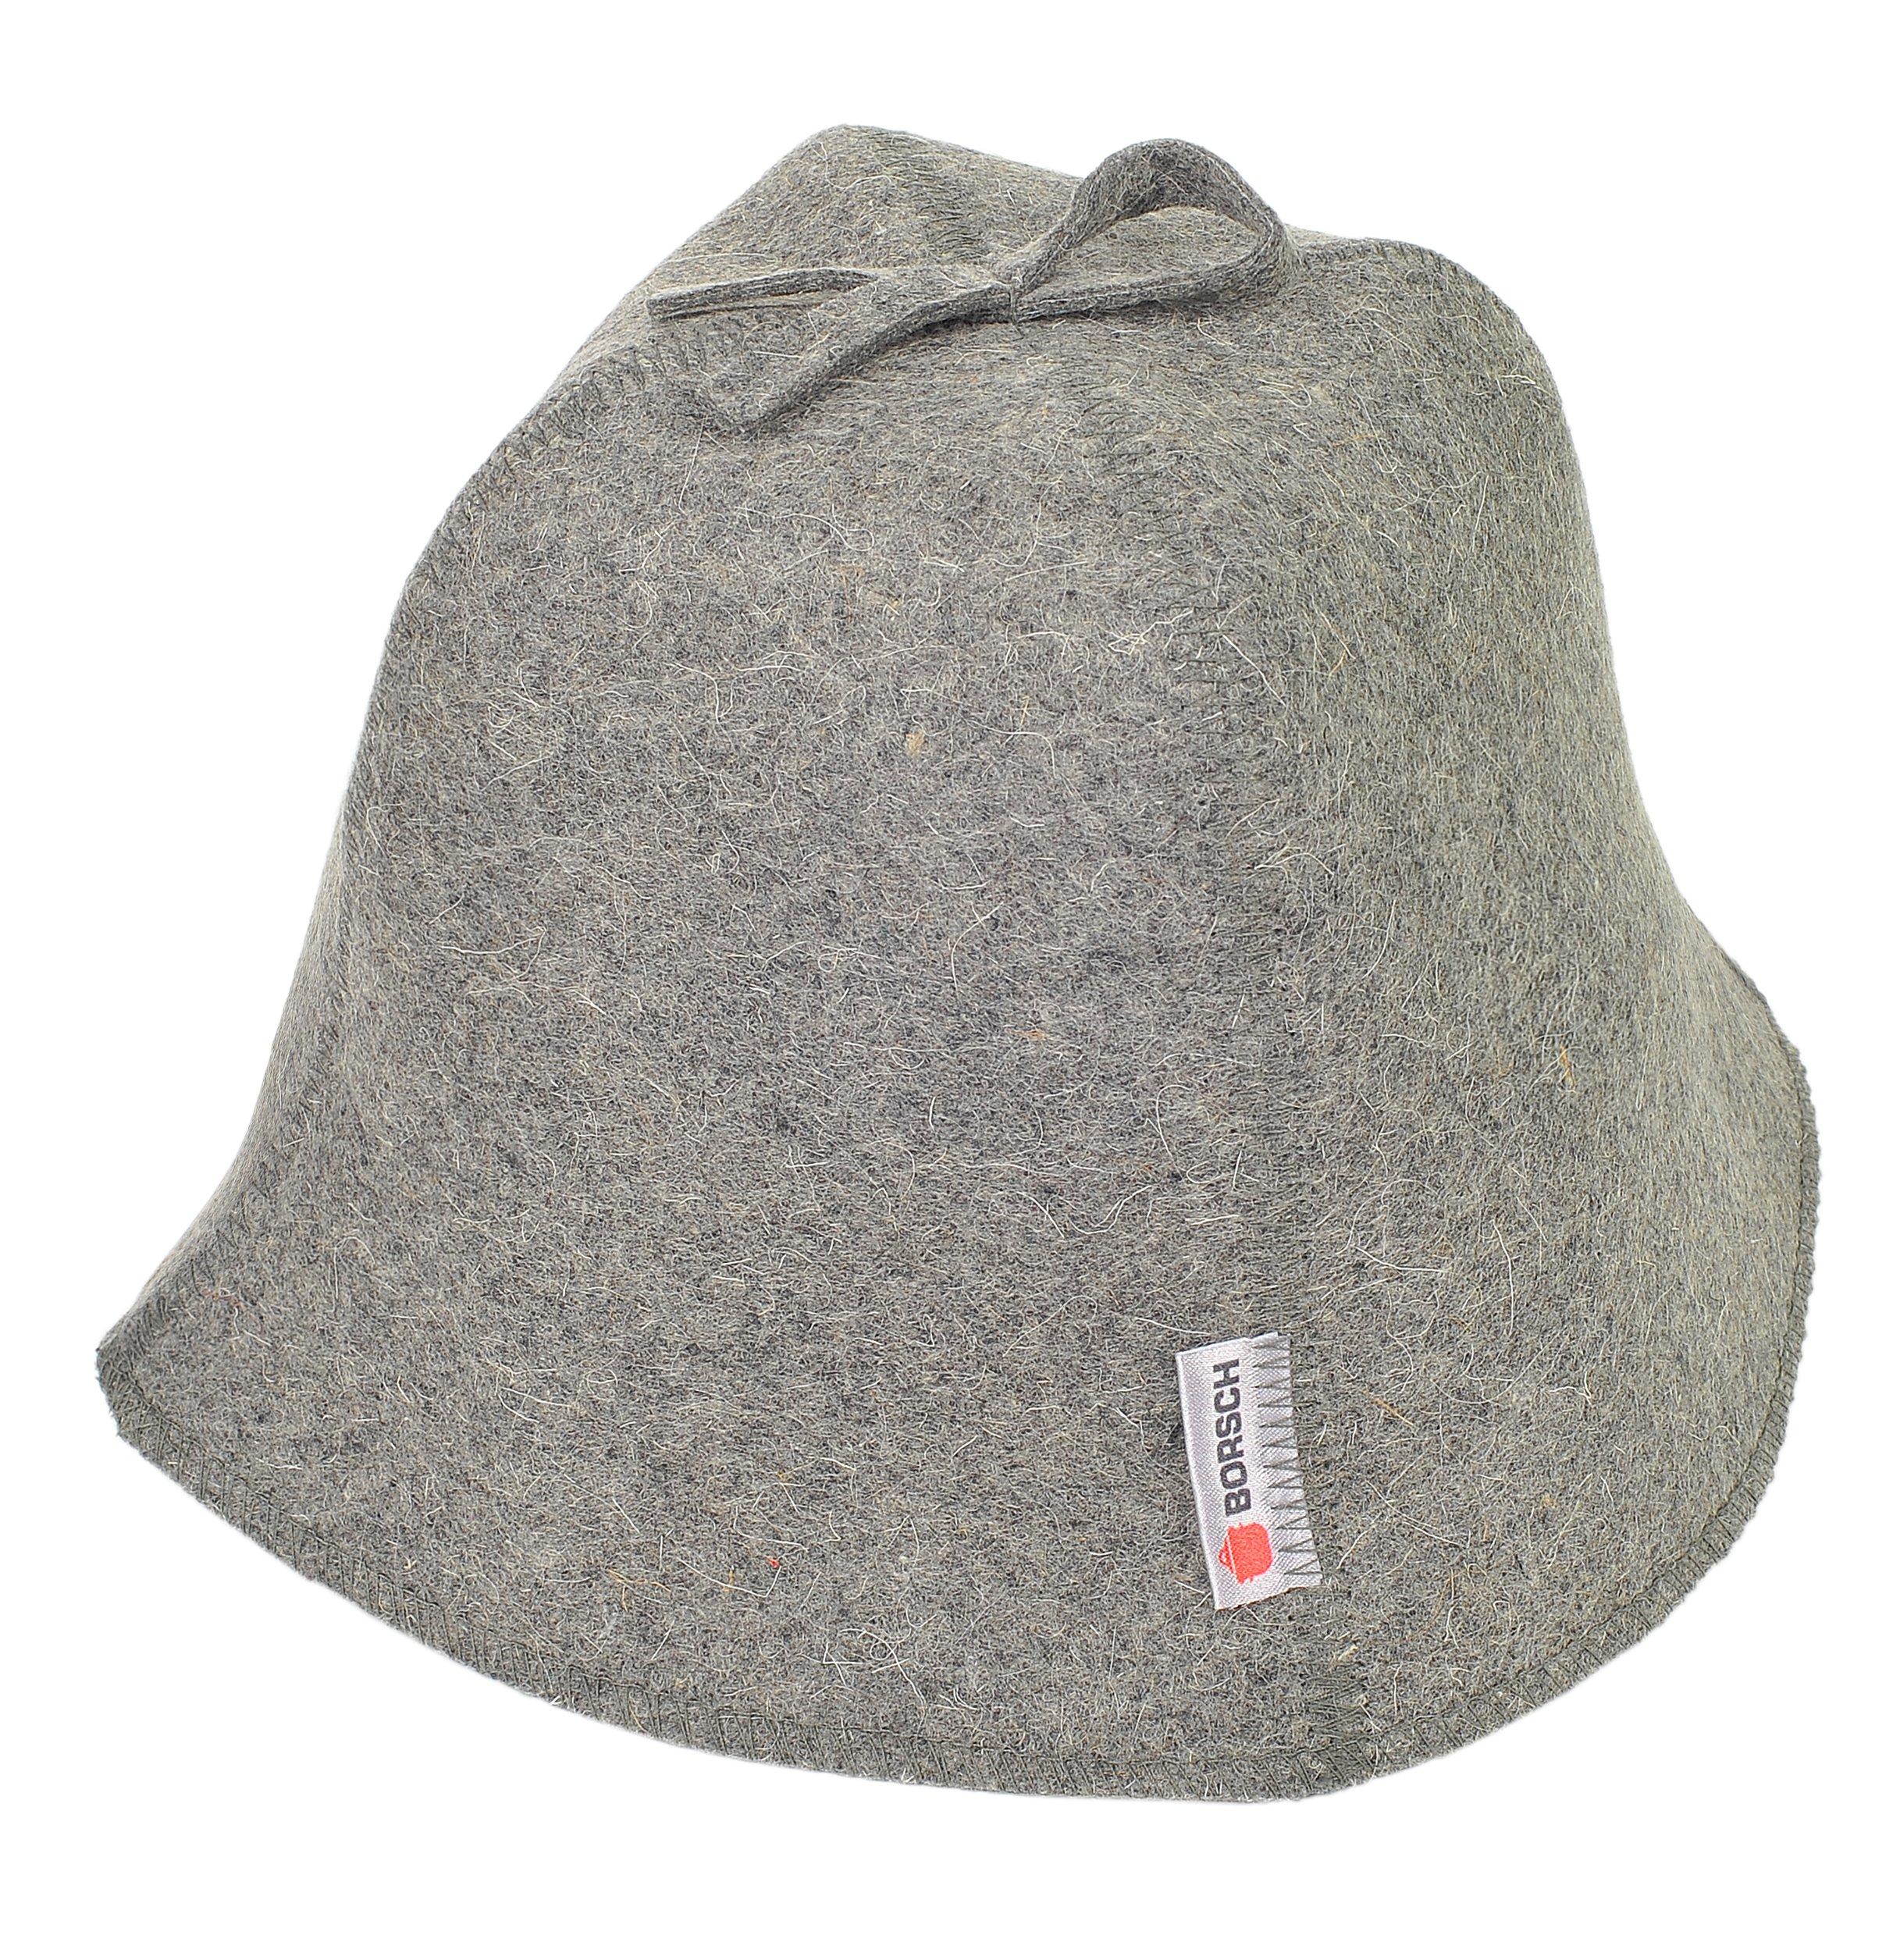 Unisex Grey Wool Felt Bath Beanie Sauna Hat Head Protection Sauna Caps Supplies